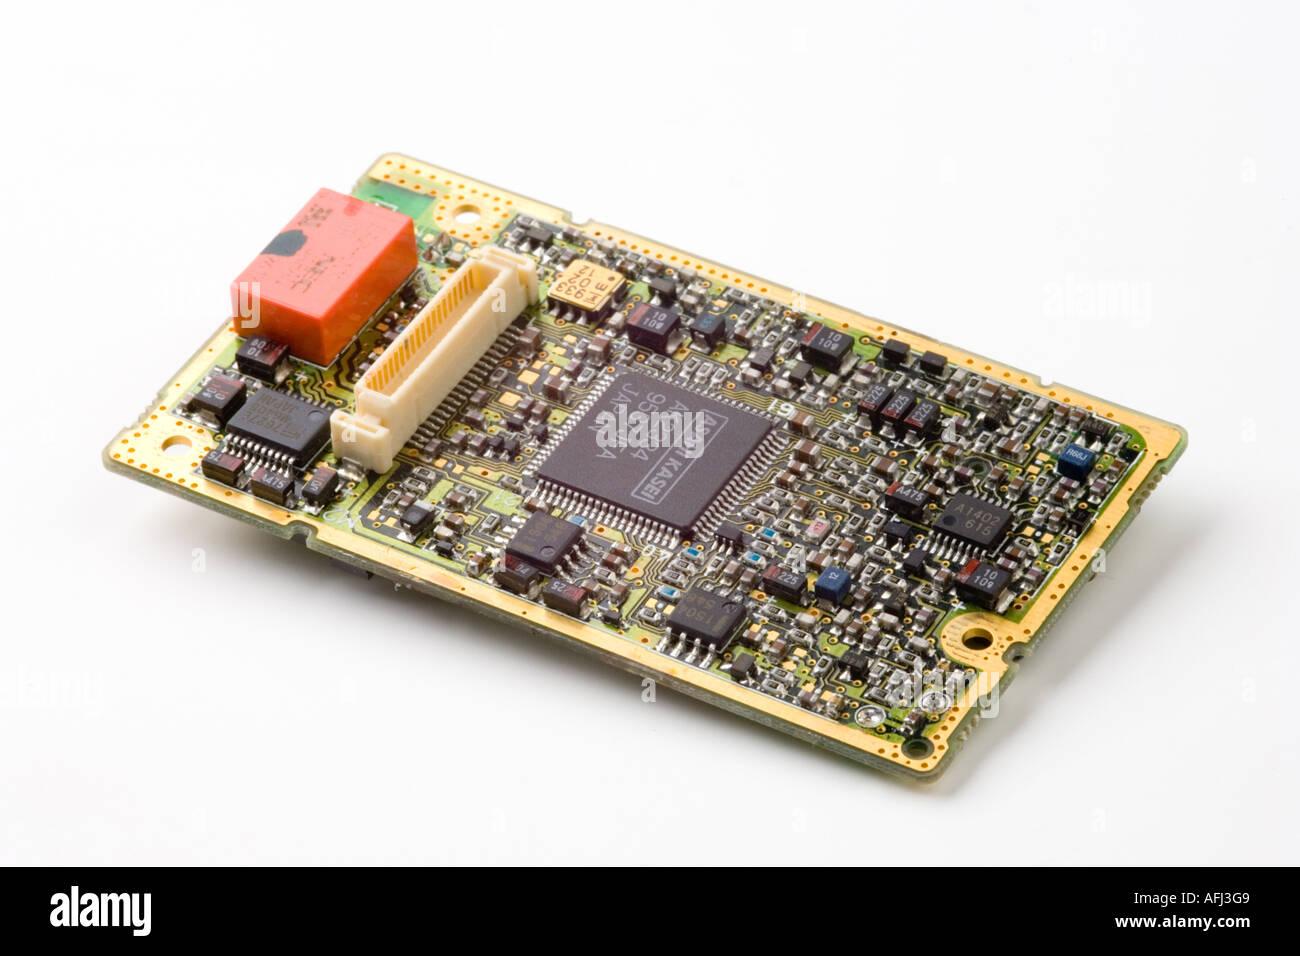 printed circuit board - Stock Image